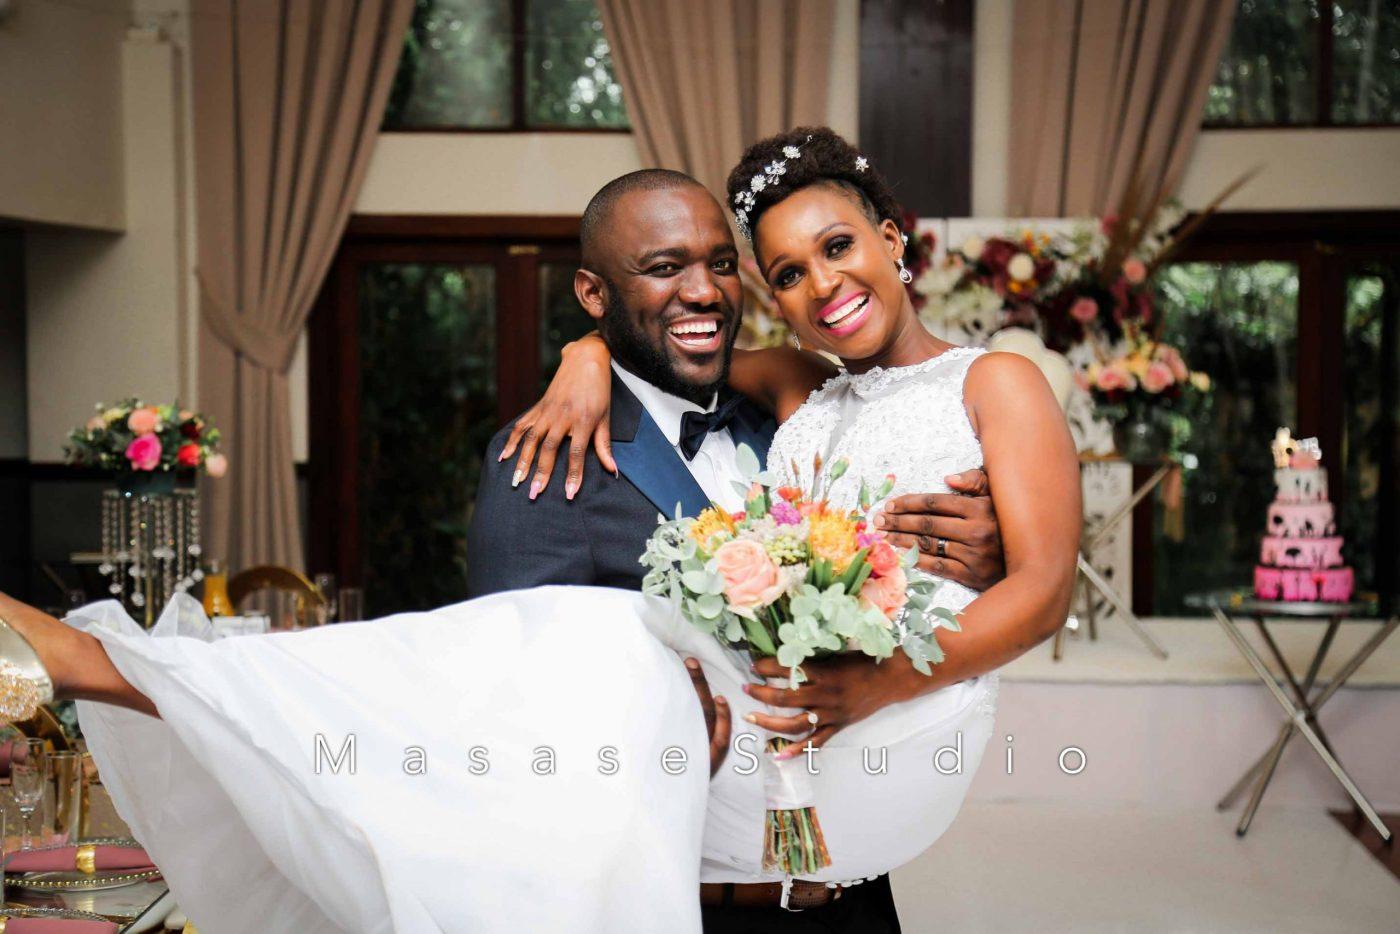 Livhu and Tshepiso Wedding anniversary at olympusmanorweddingvenuespretoria wedding photographer37